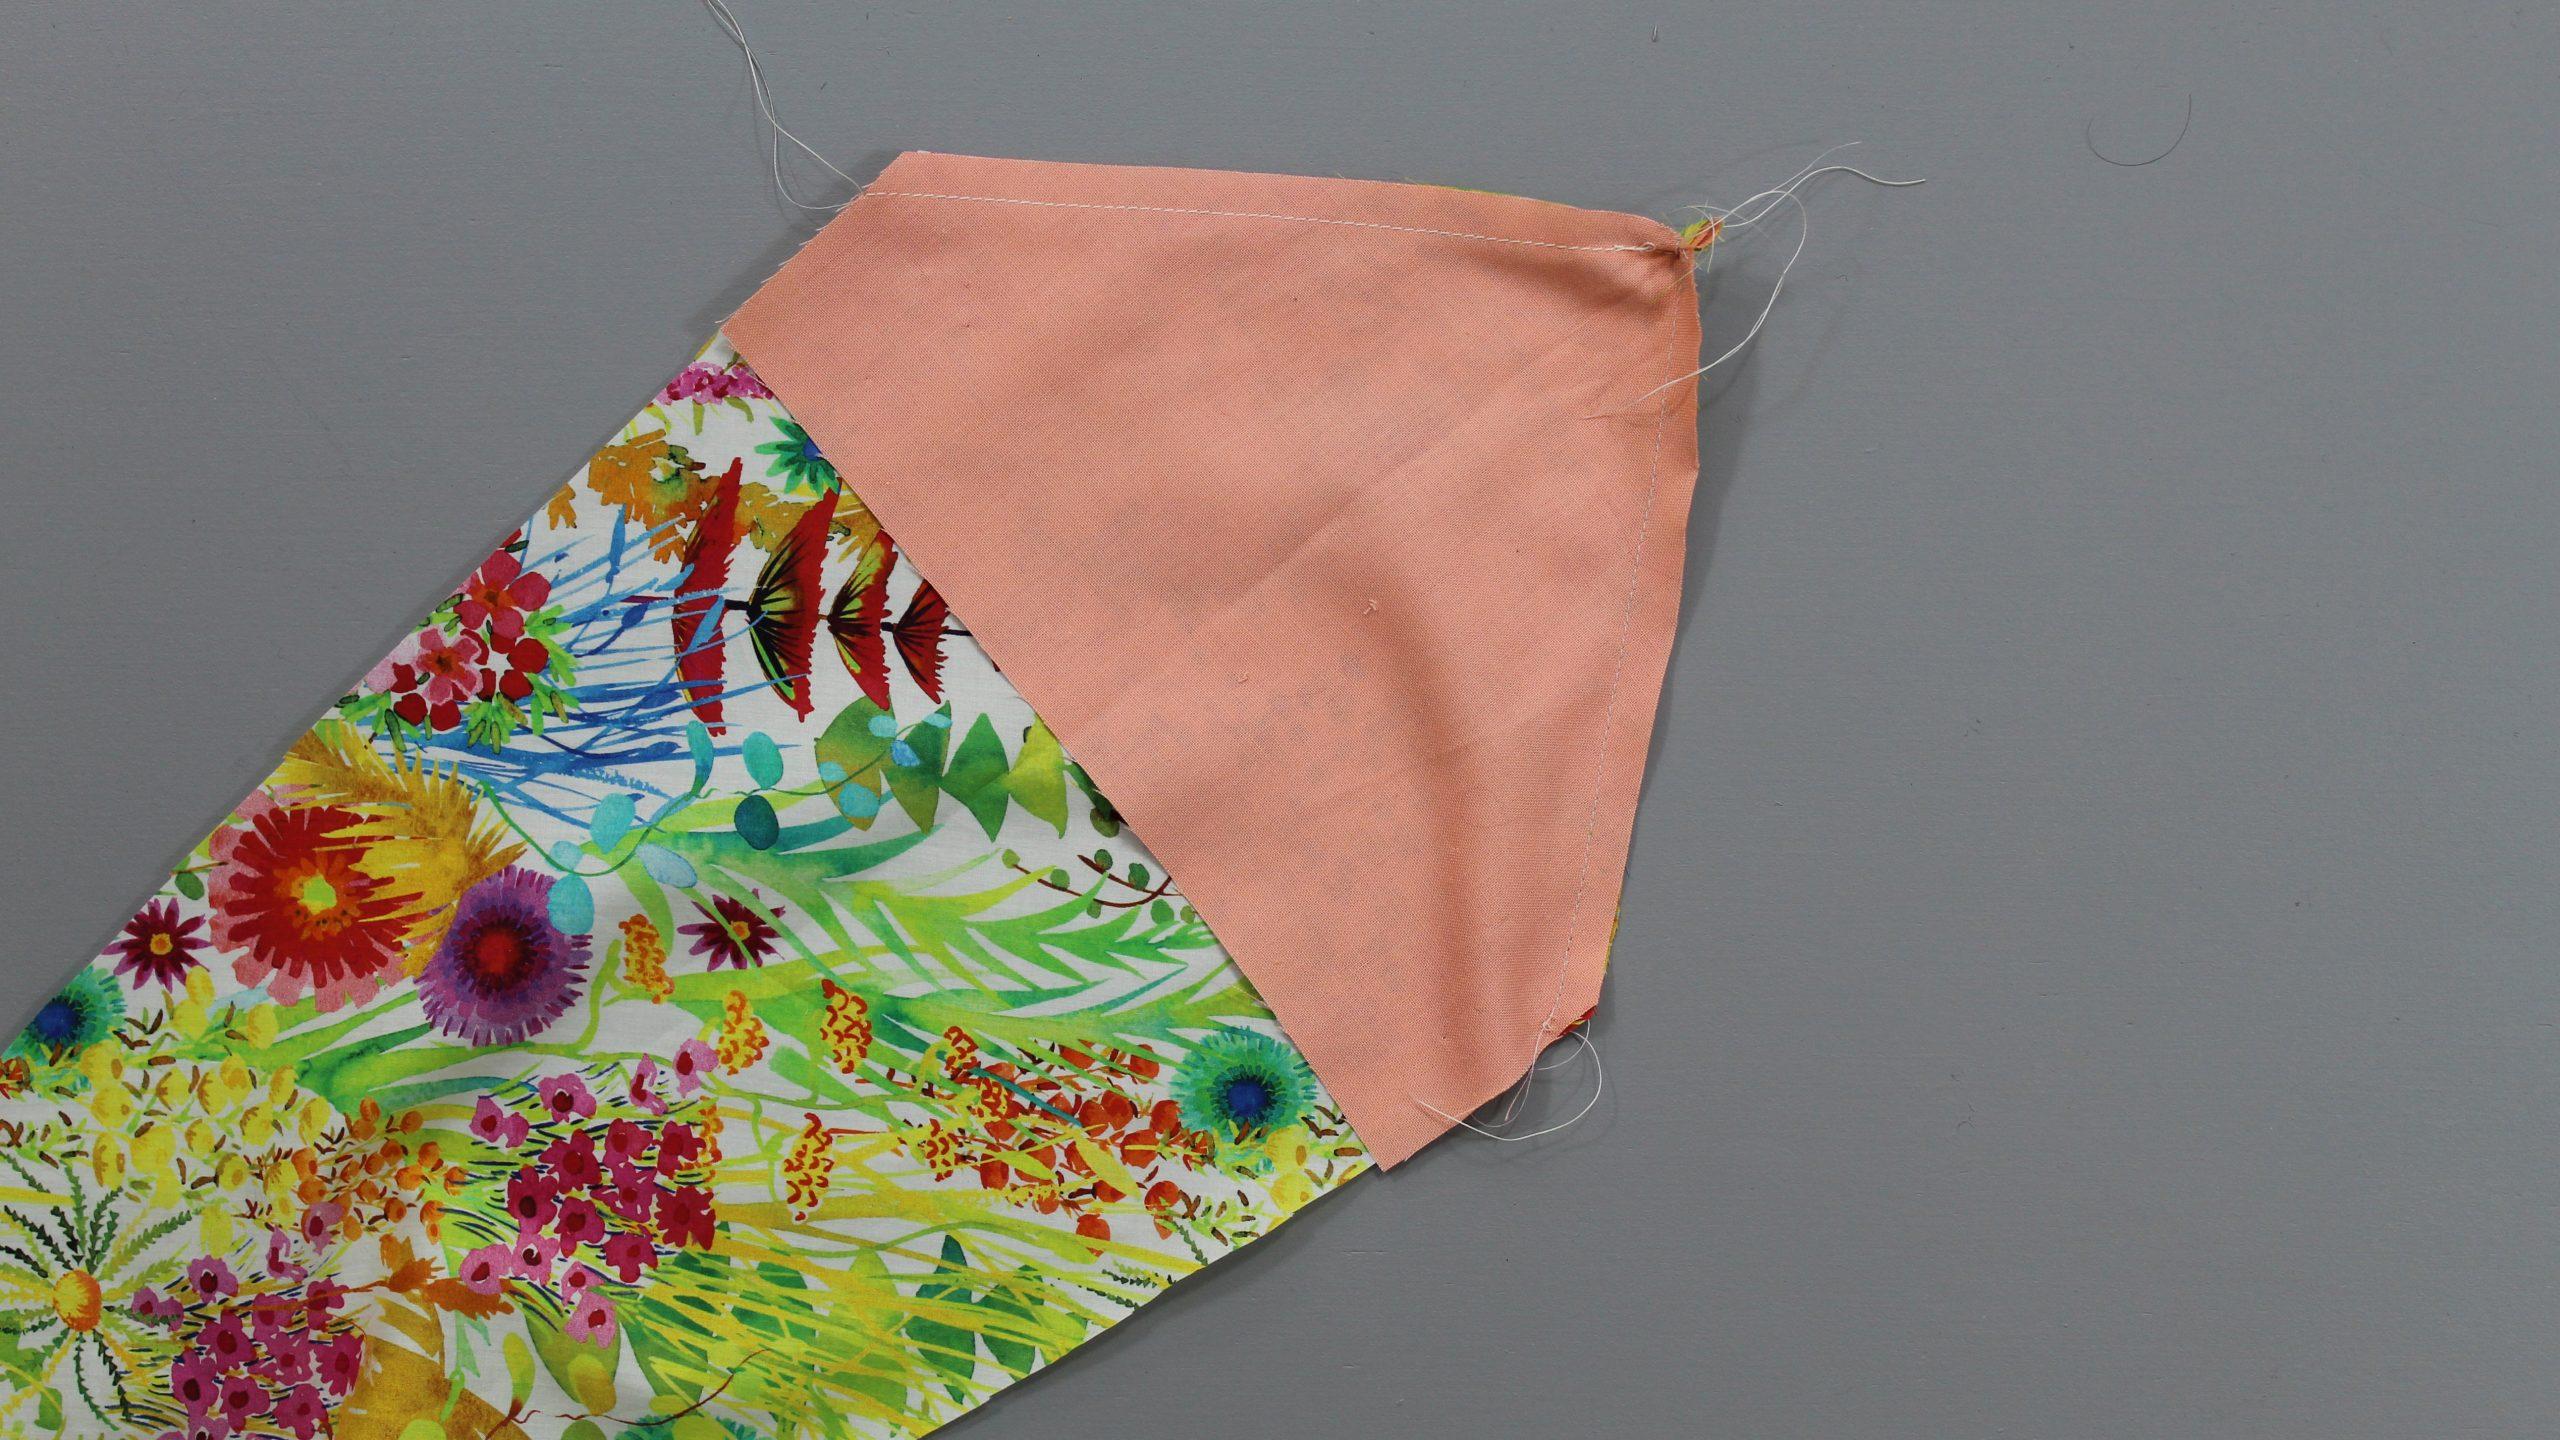 Stitch bottom of tie